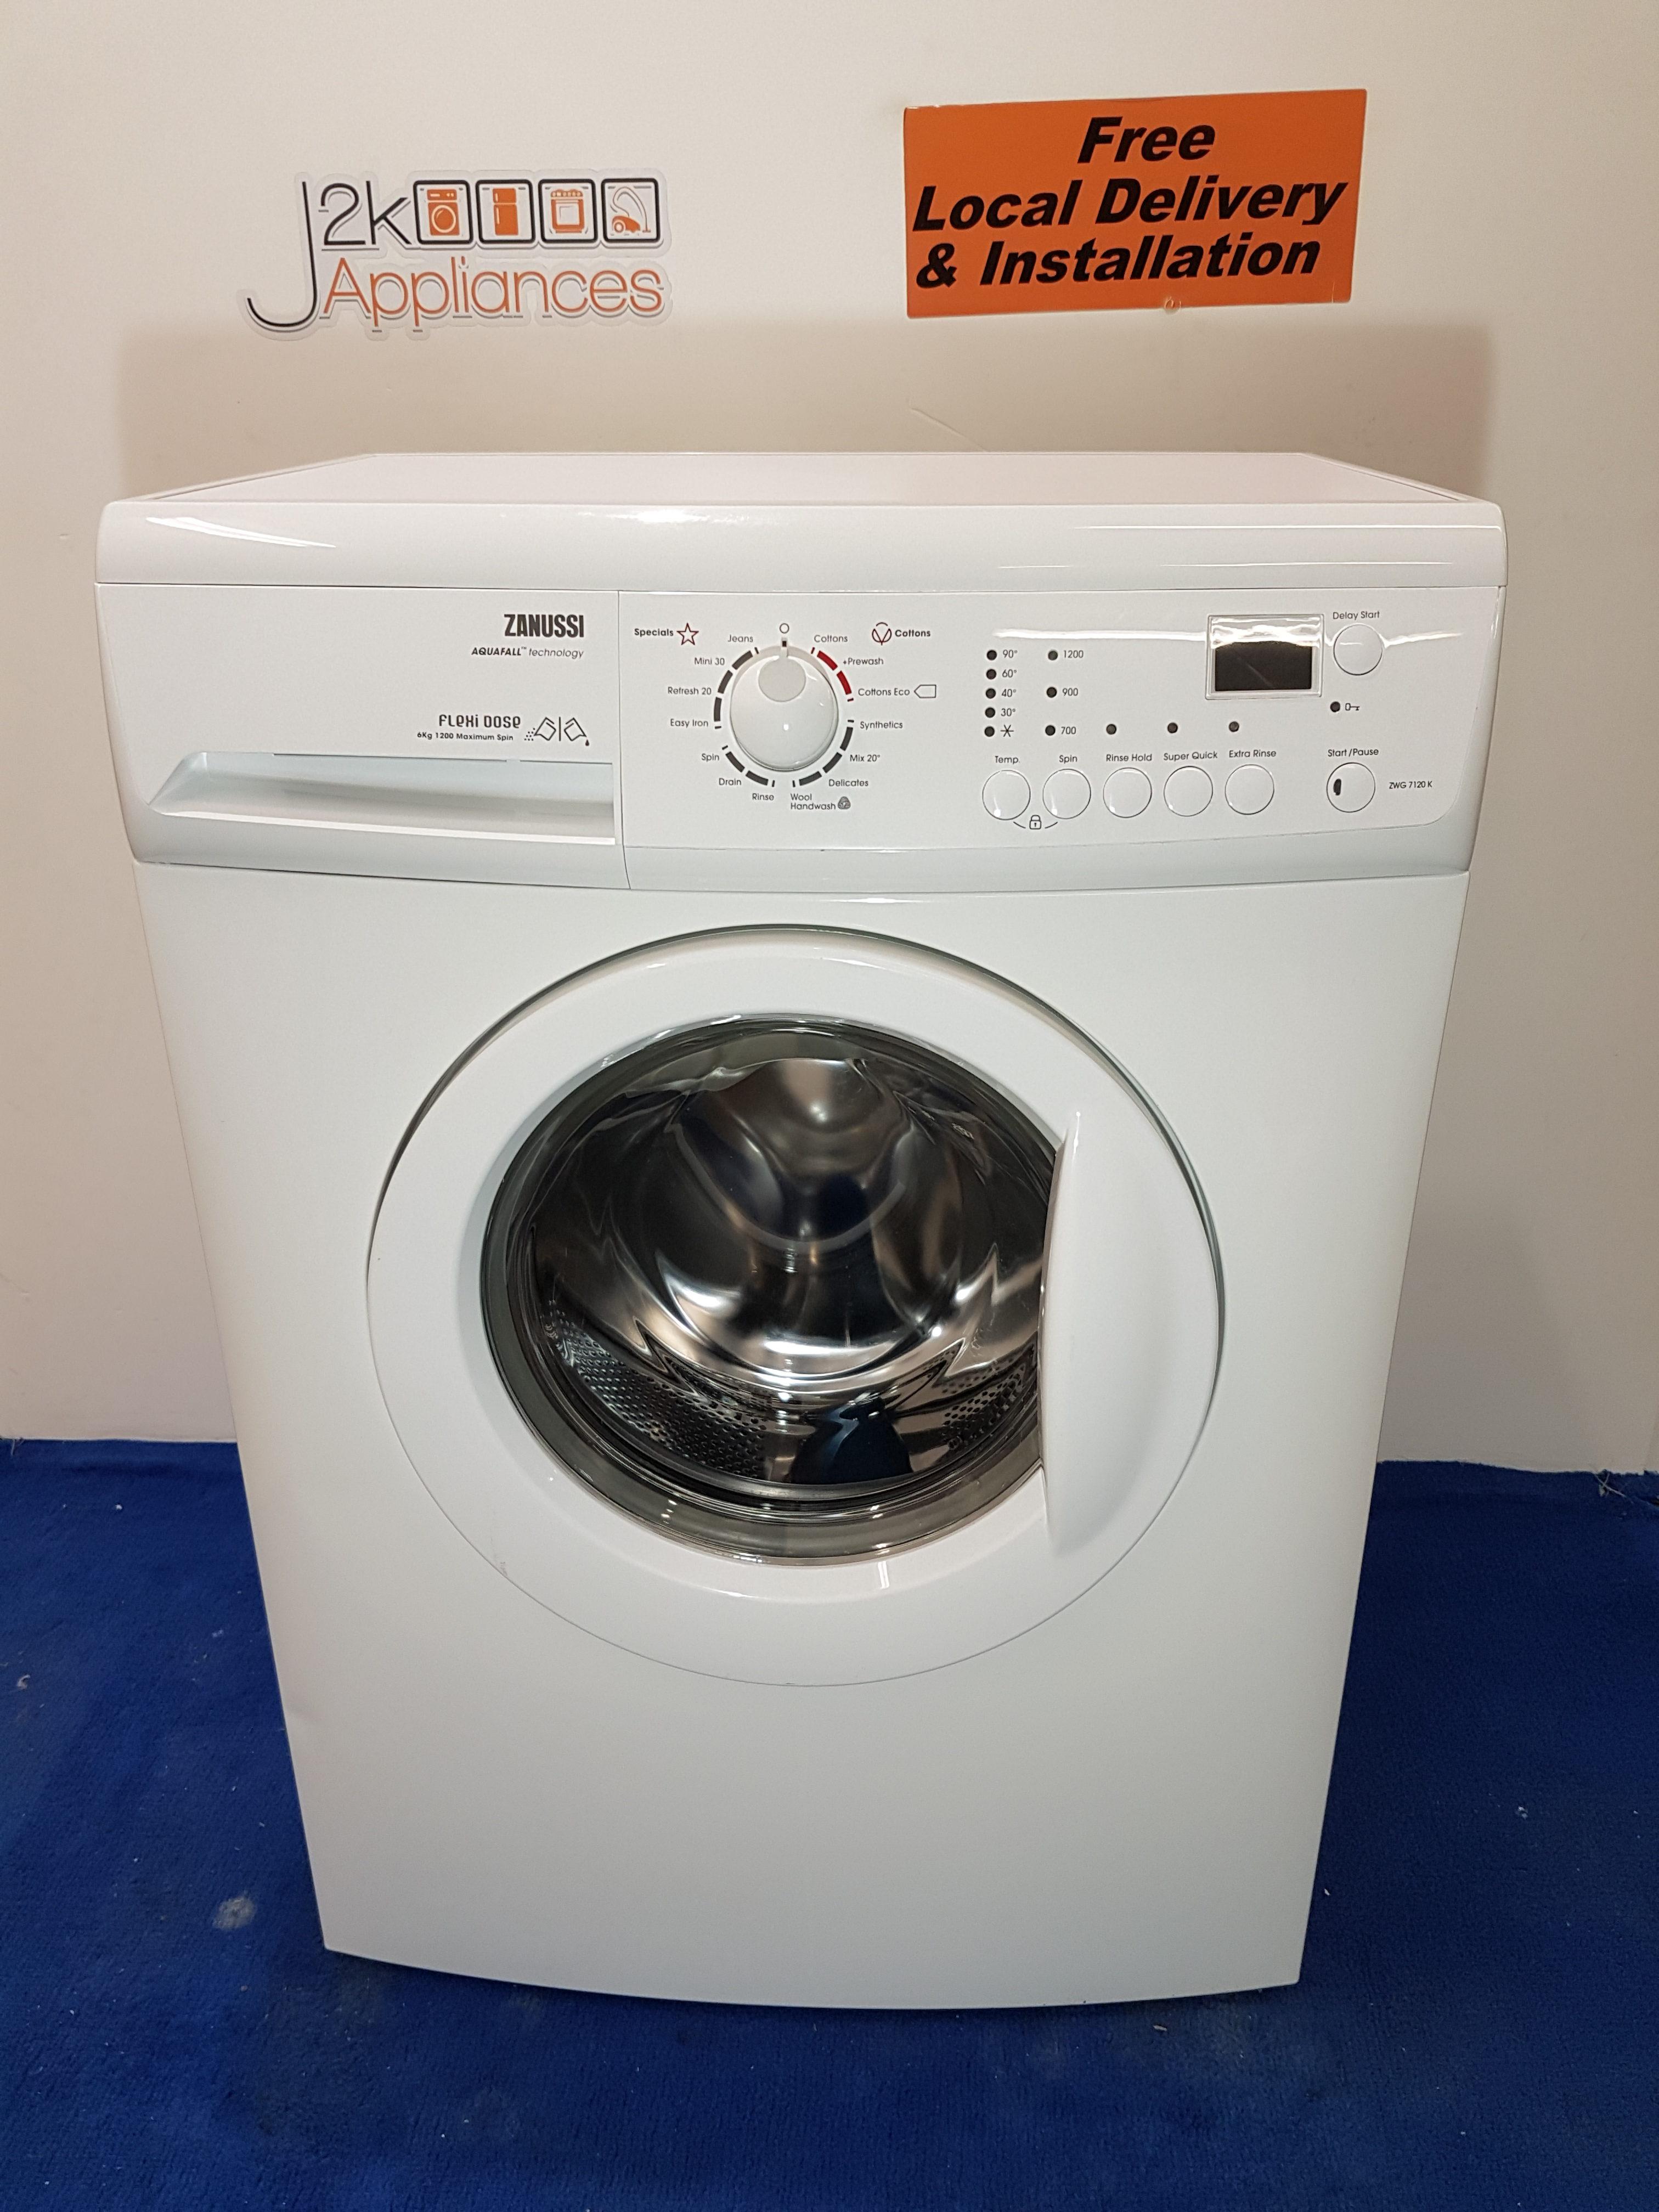 Zanussi zf1002c (91478901700) washing machine w panel,user manual.